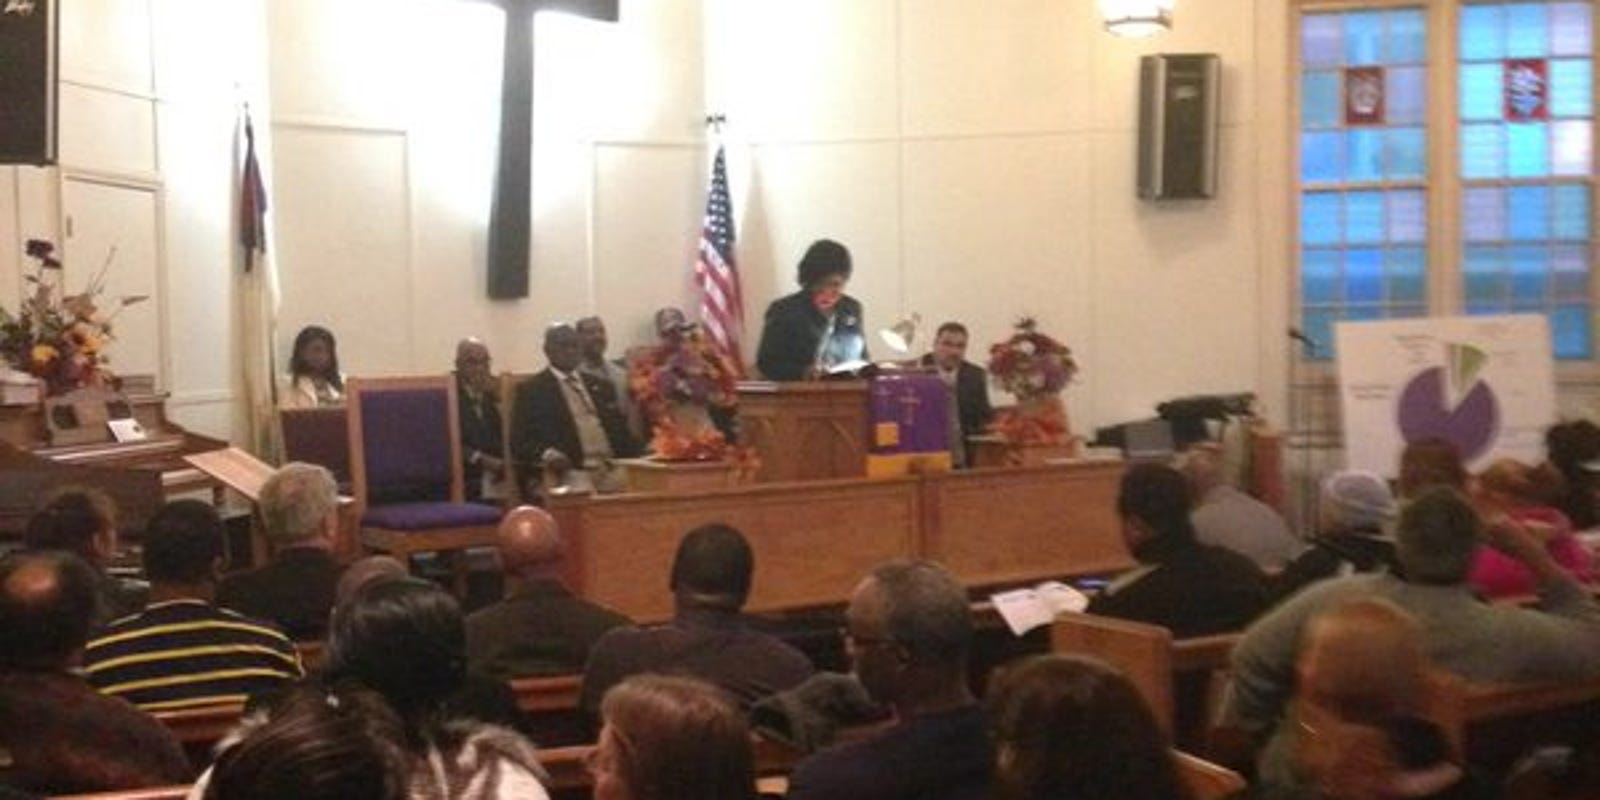 Faith-Based Group Sets Minority Hiring Goals